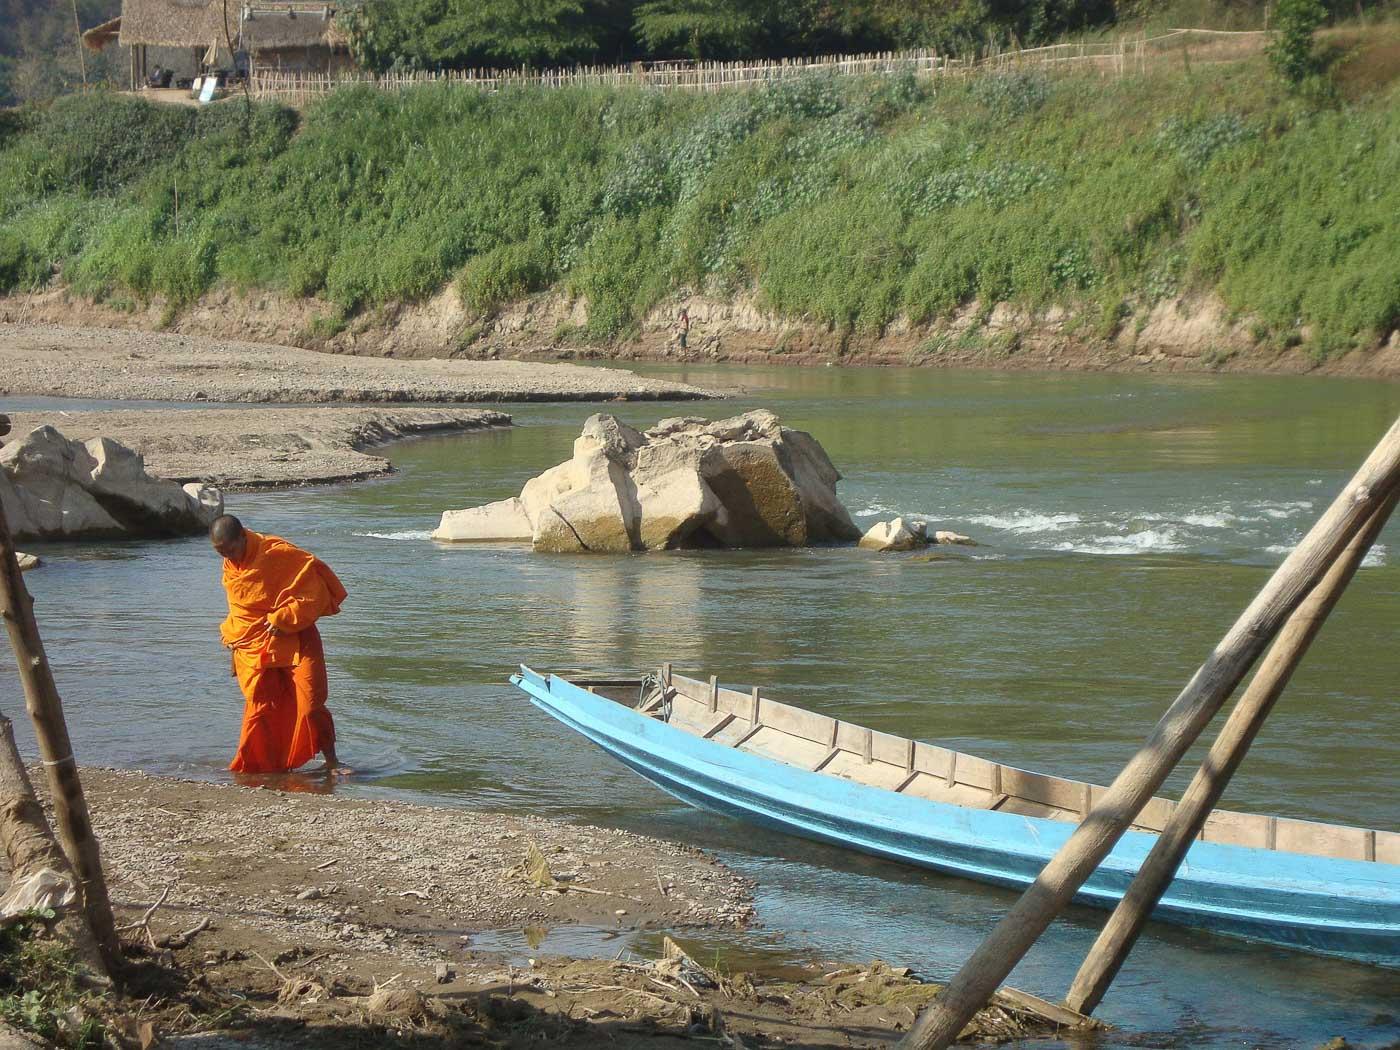 Turismo no Laos - Rio onde eu perdi meu Drone